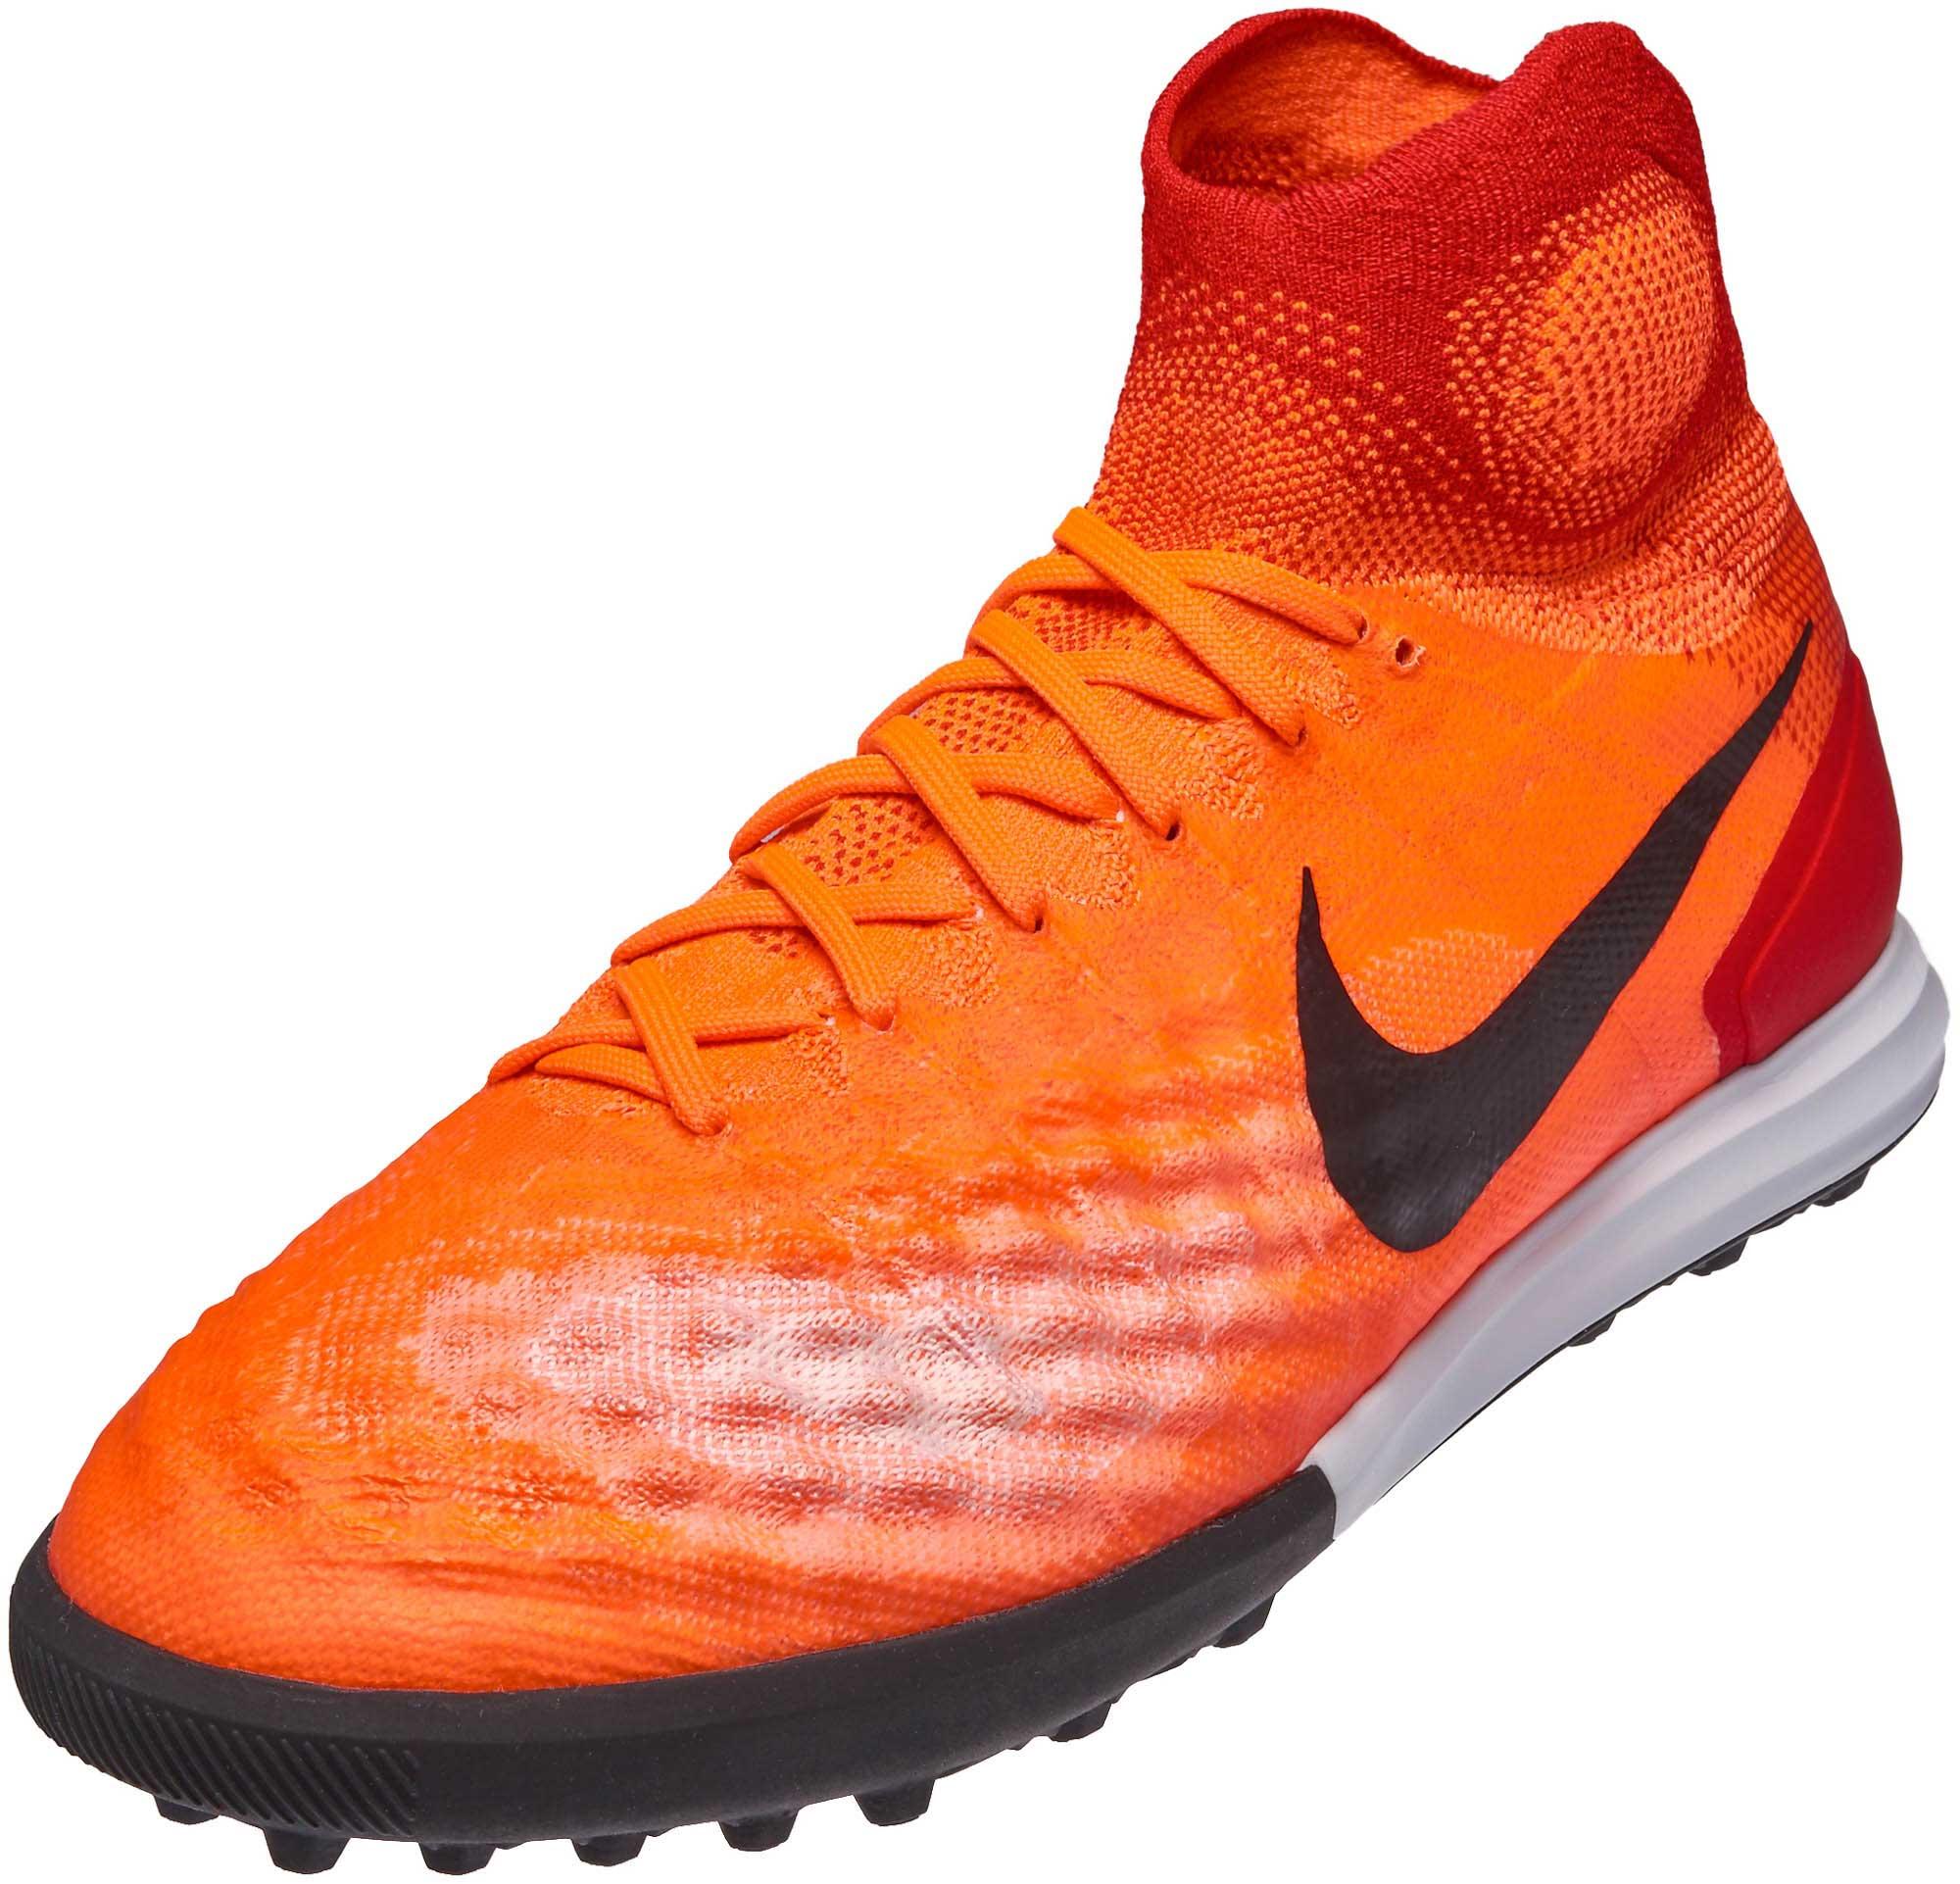 83b2dcdd7 Nike MagistaX Proximo II TF – Total Crimson University Red